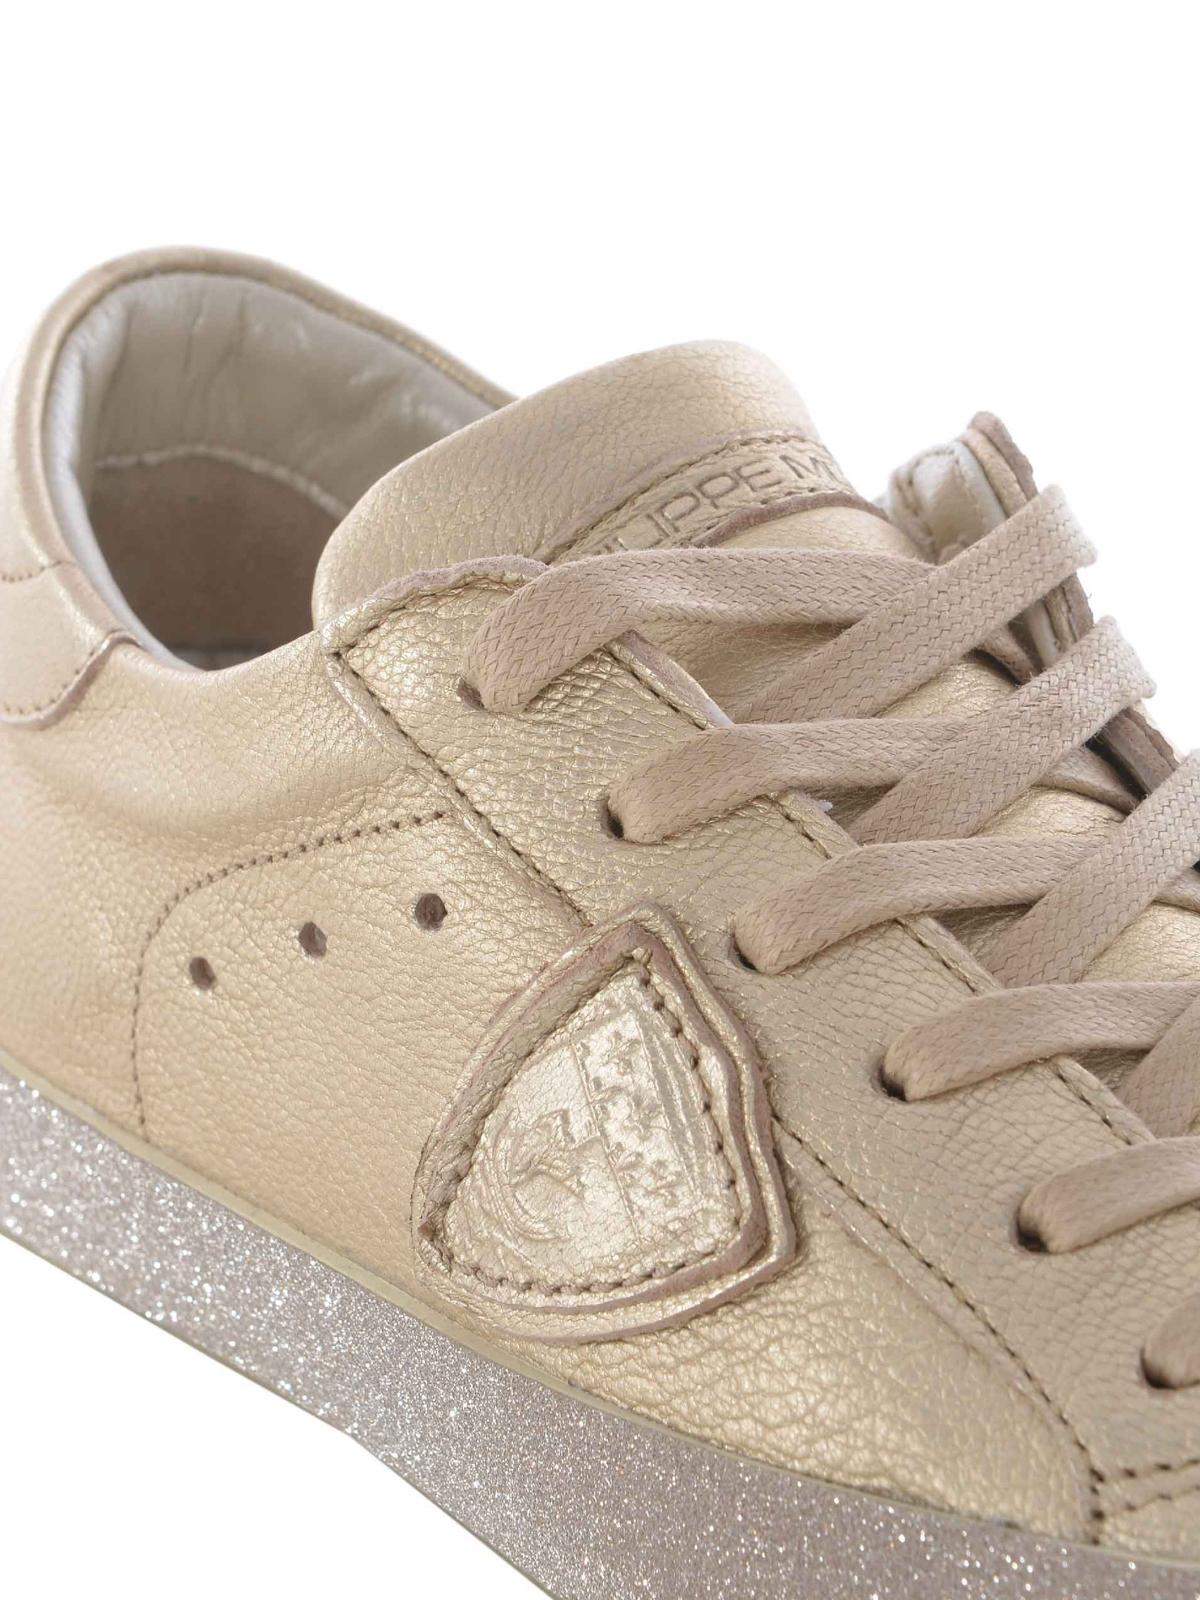 sneaker paris glitter in pelle philippe model sneakers. Black Bedroom Furniture Sets. Home Design Ideas